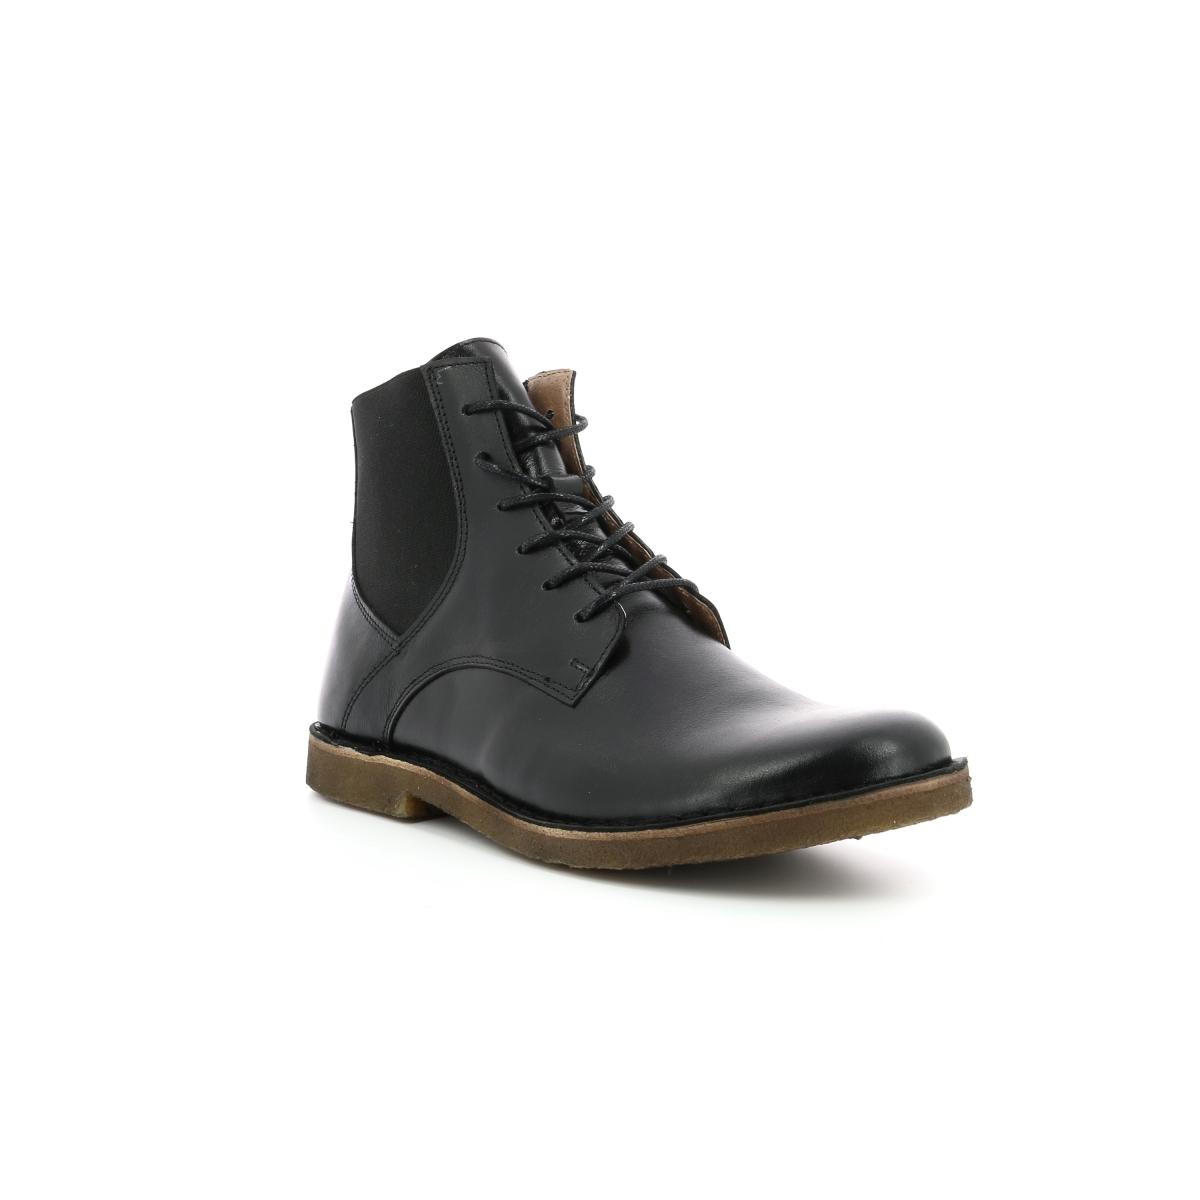 Chaussures Noir Titi Kickers Kickers Femme Femme Chaussures Titi Noir wq5OU5FH